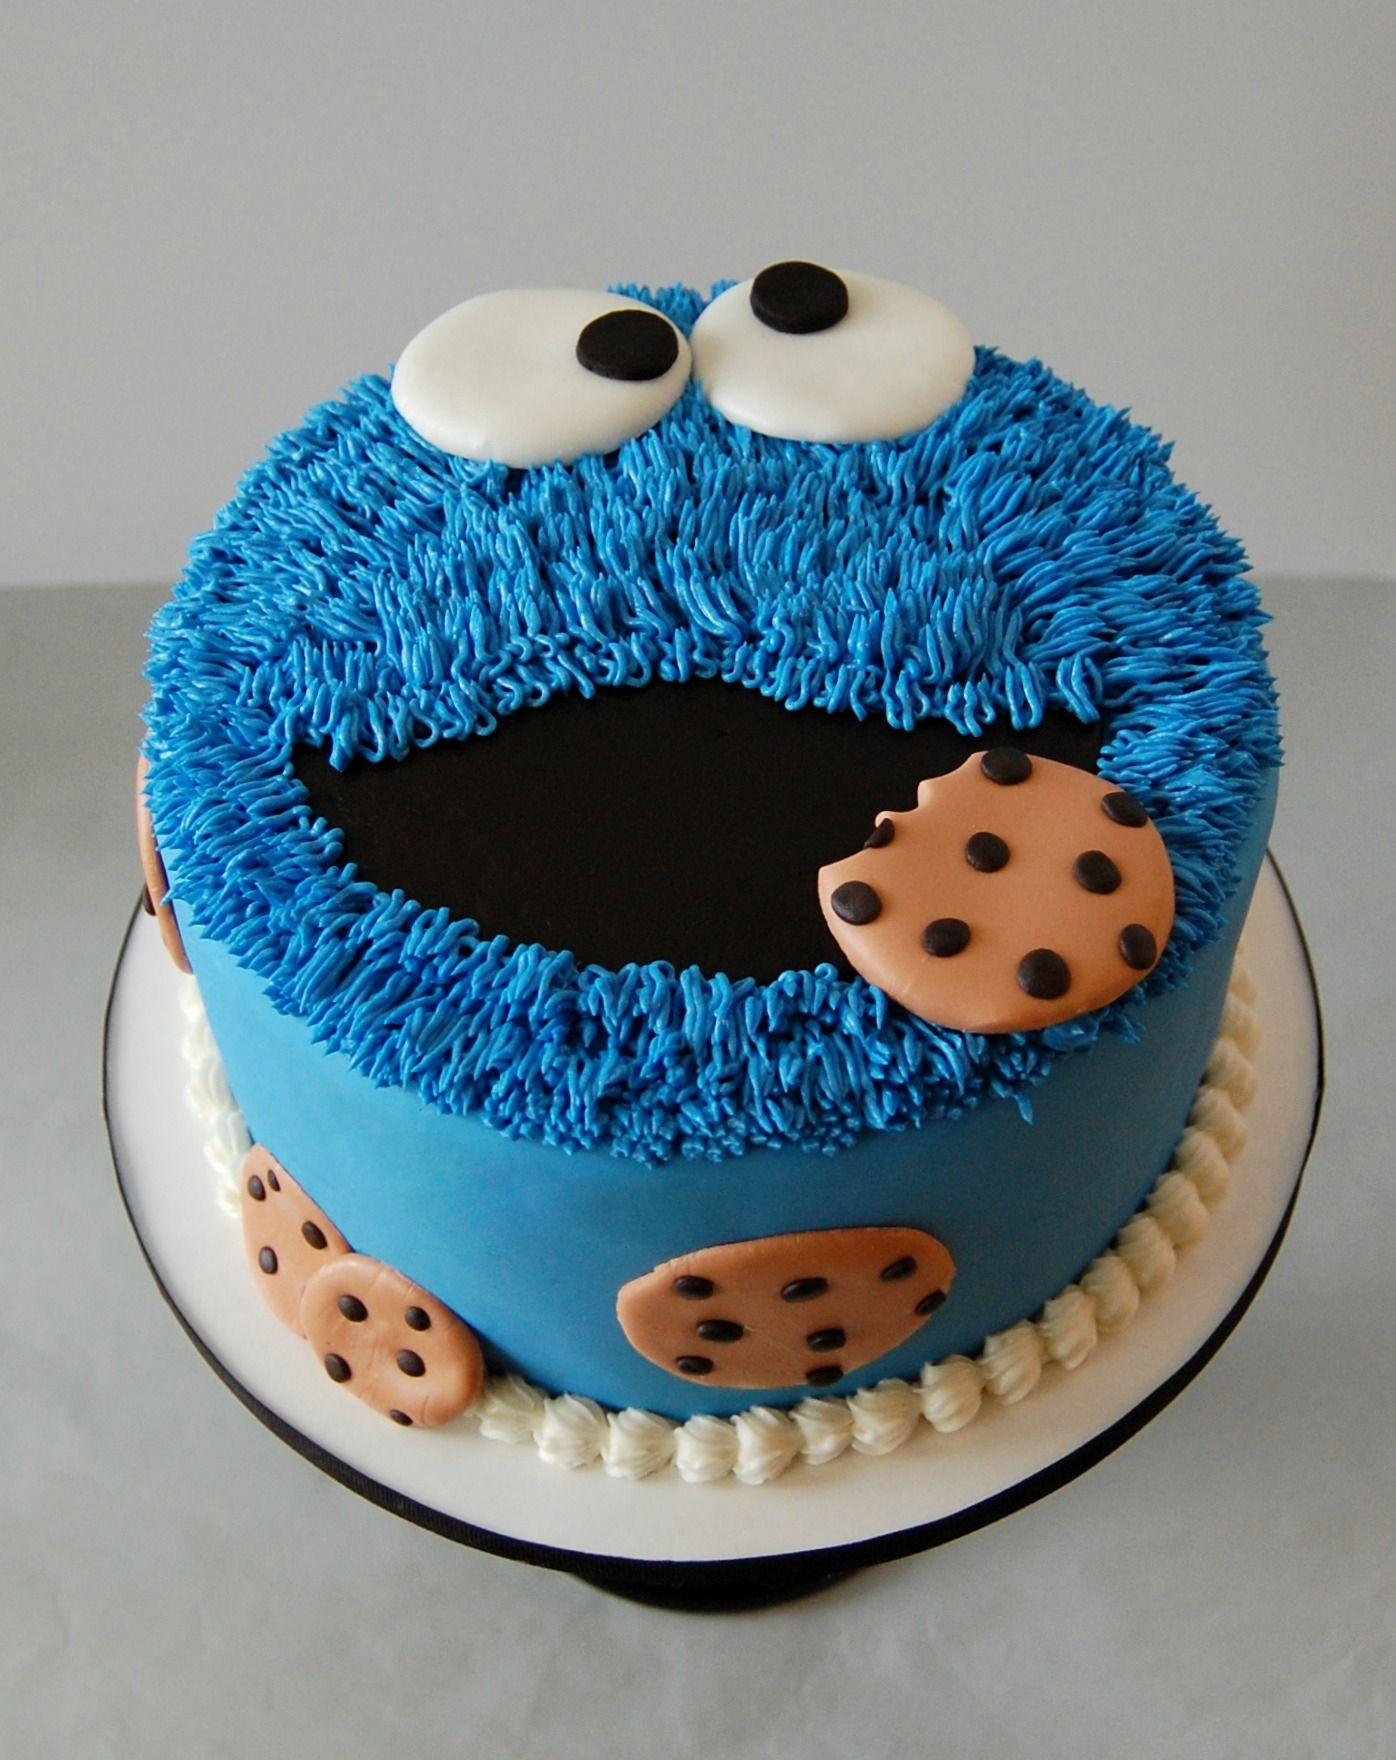 Cookie Monster Cake 1 tier 8 inch Cookie Monster cake | Alp birthday ...